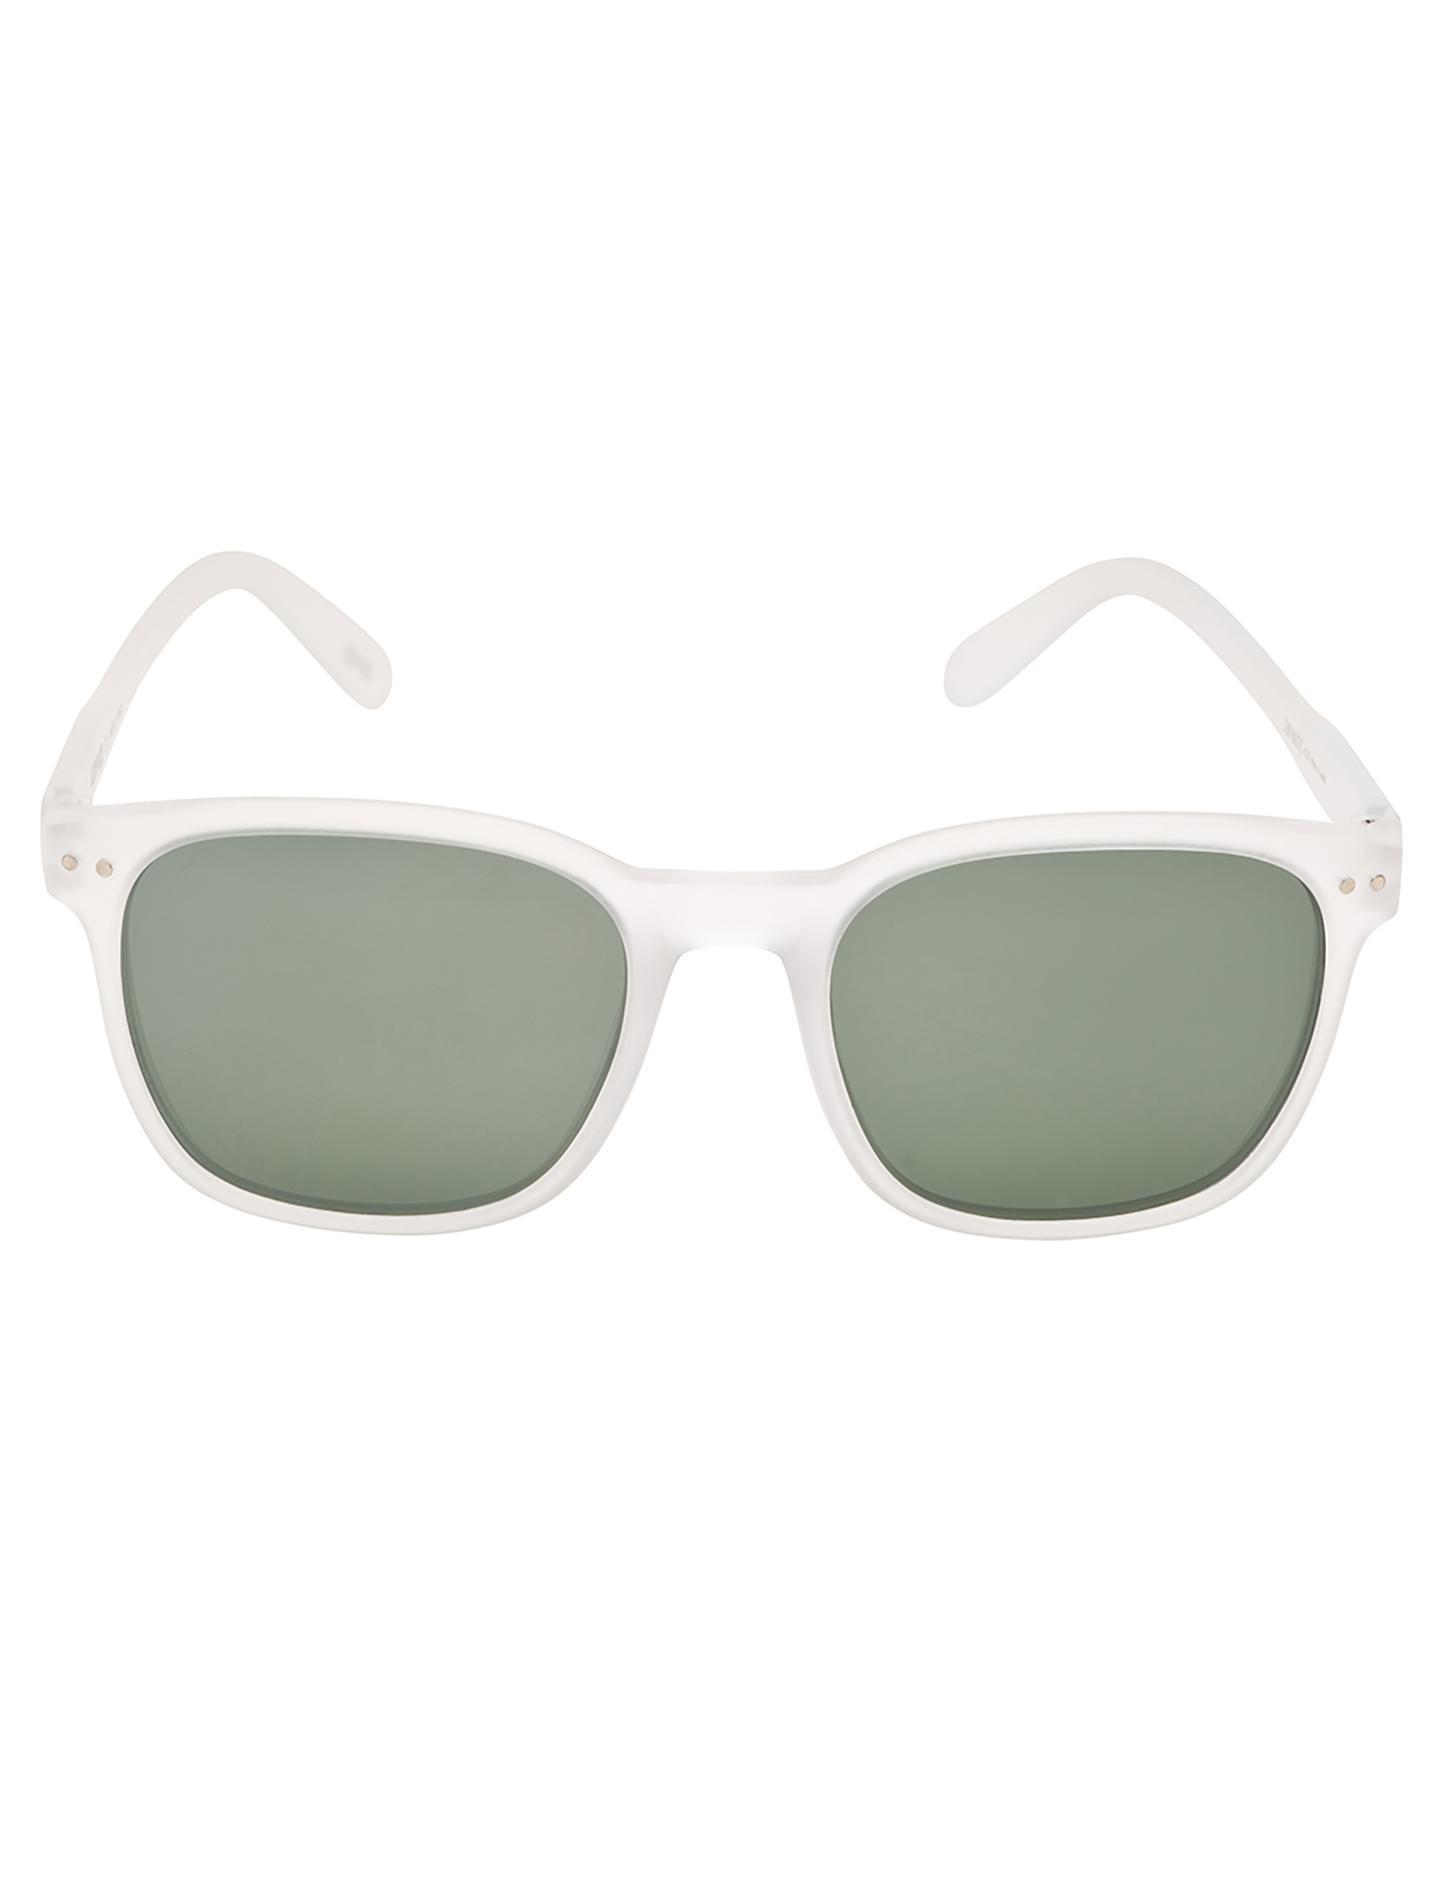 da6635ef7448a Alternative Apparel. Women s White Izipizi Sun Nautic Polarized Sunglasses